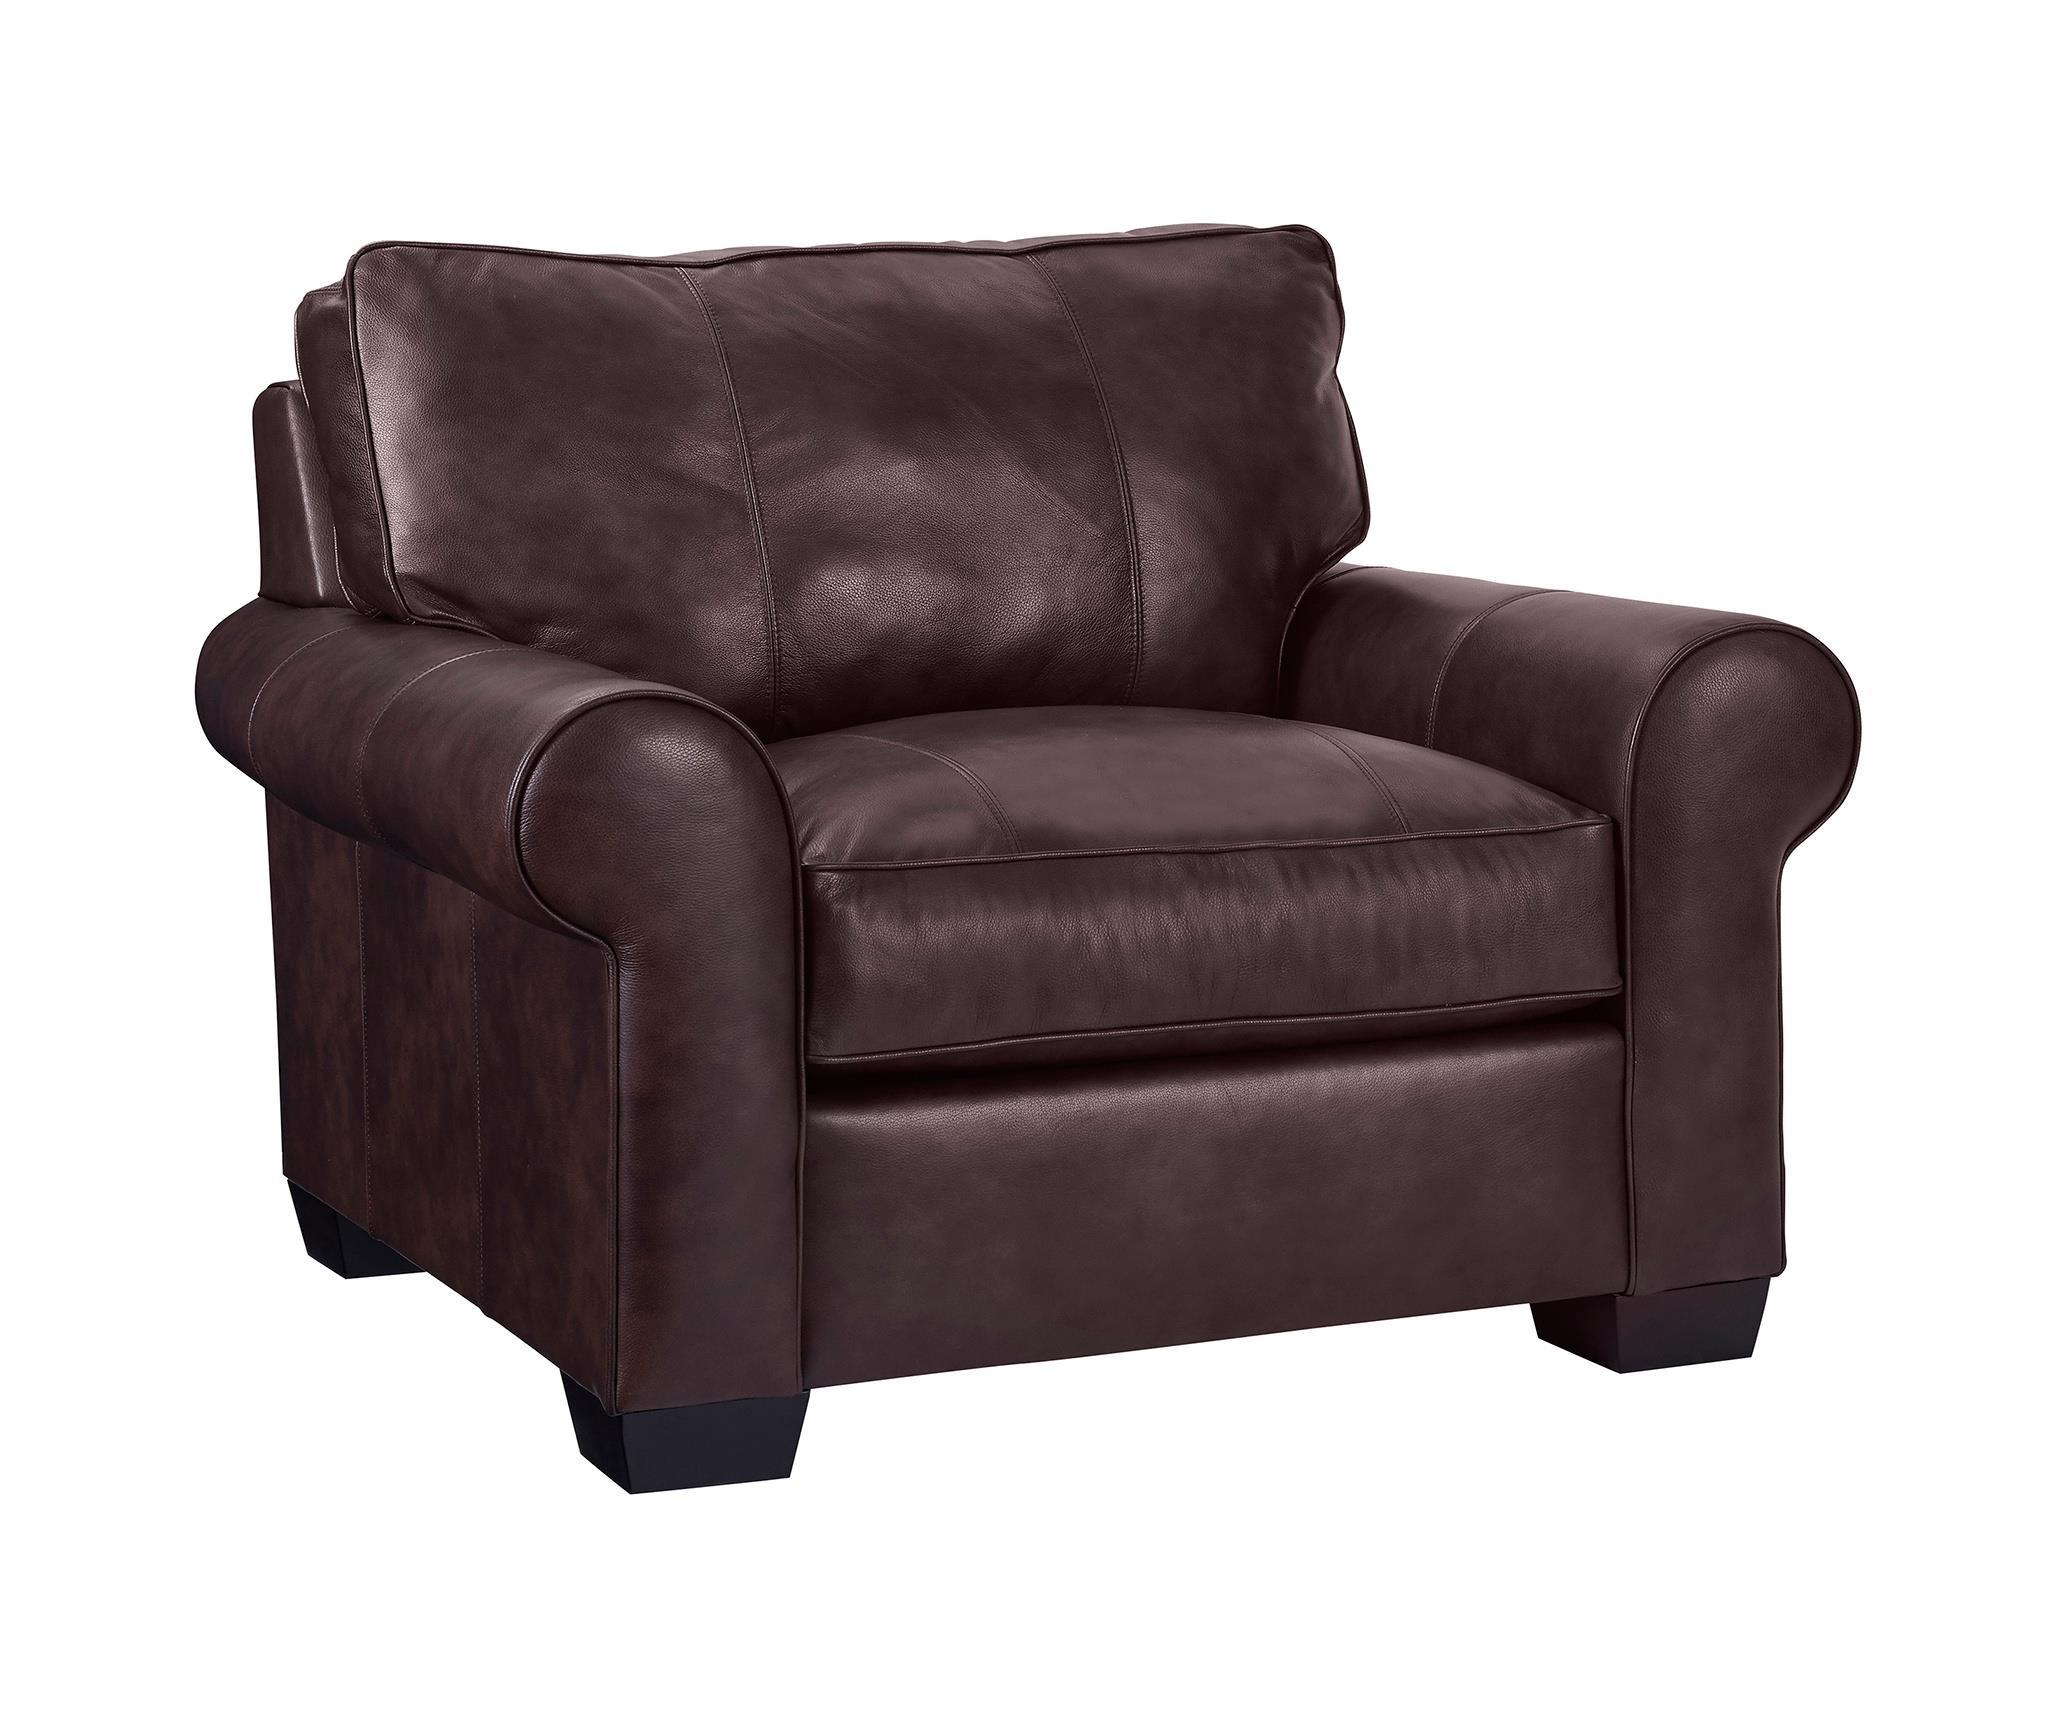 Ordinaire Broyhill Furniture IsadoreChair U0026 1/2